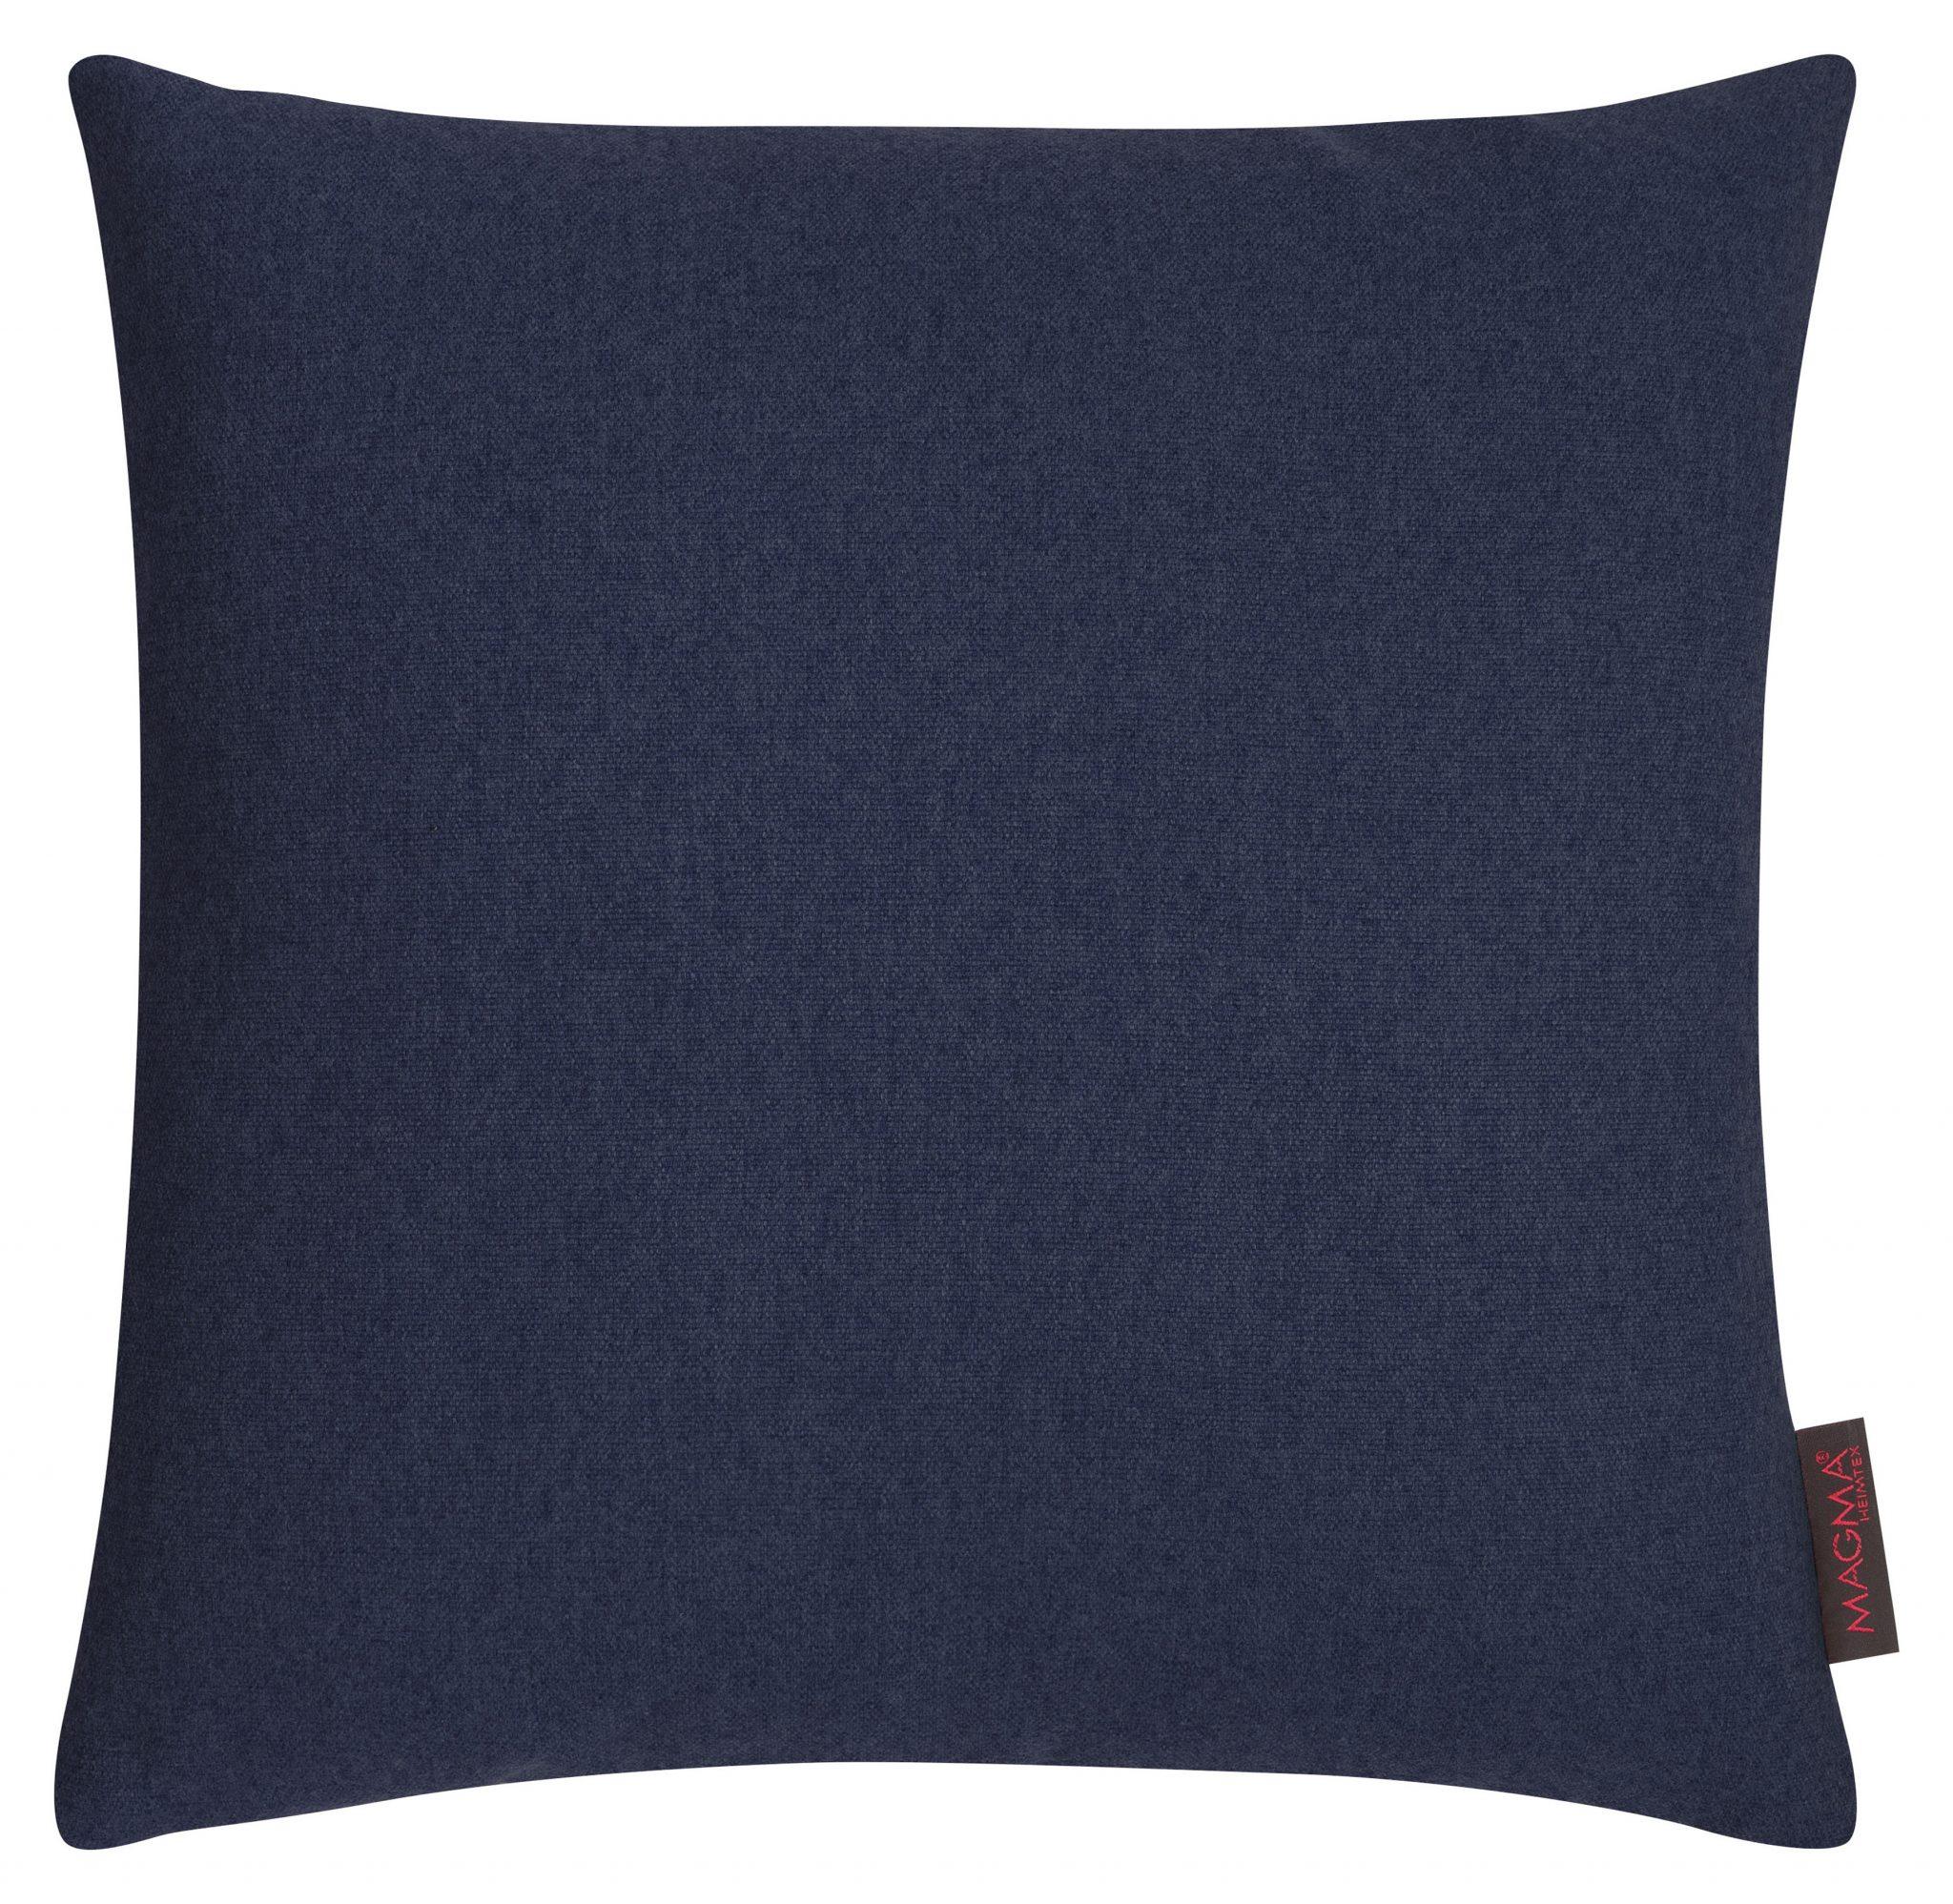 Kissen Magma FELT dunkelblau mit Federfüllung 50x50 |60x60